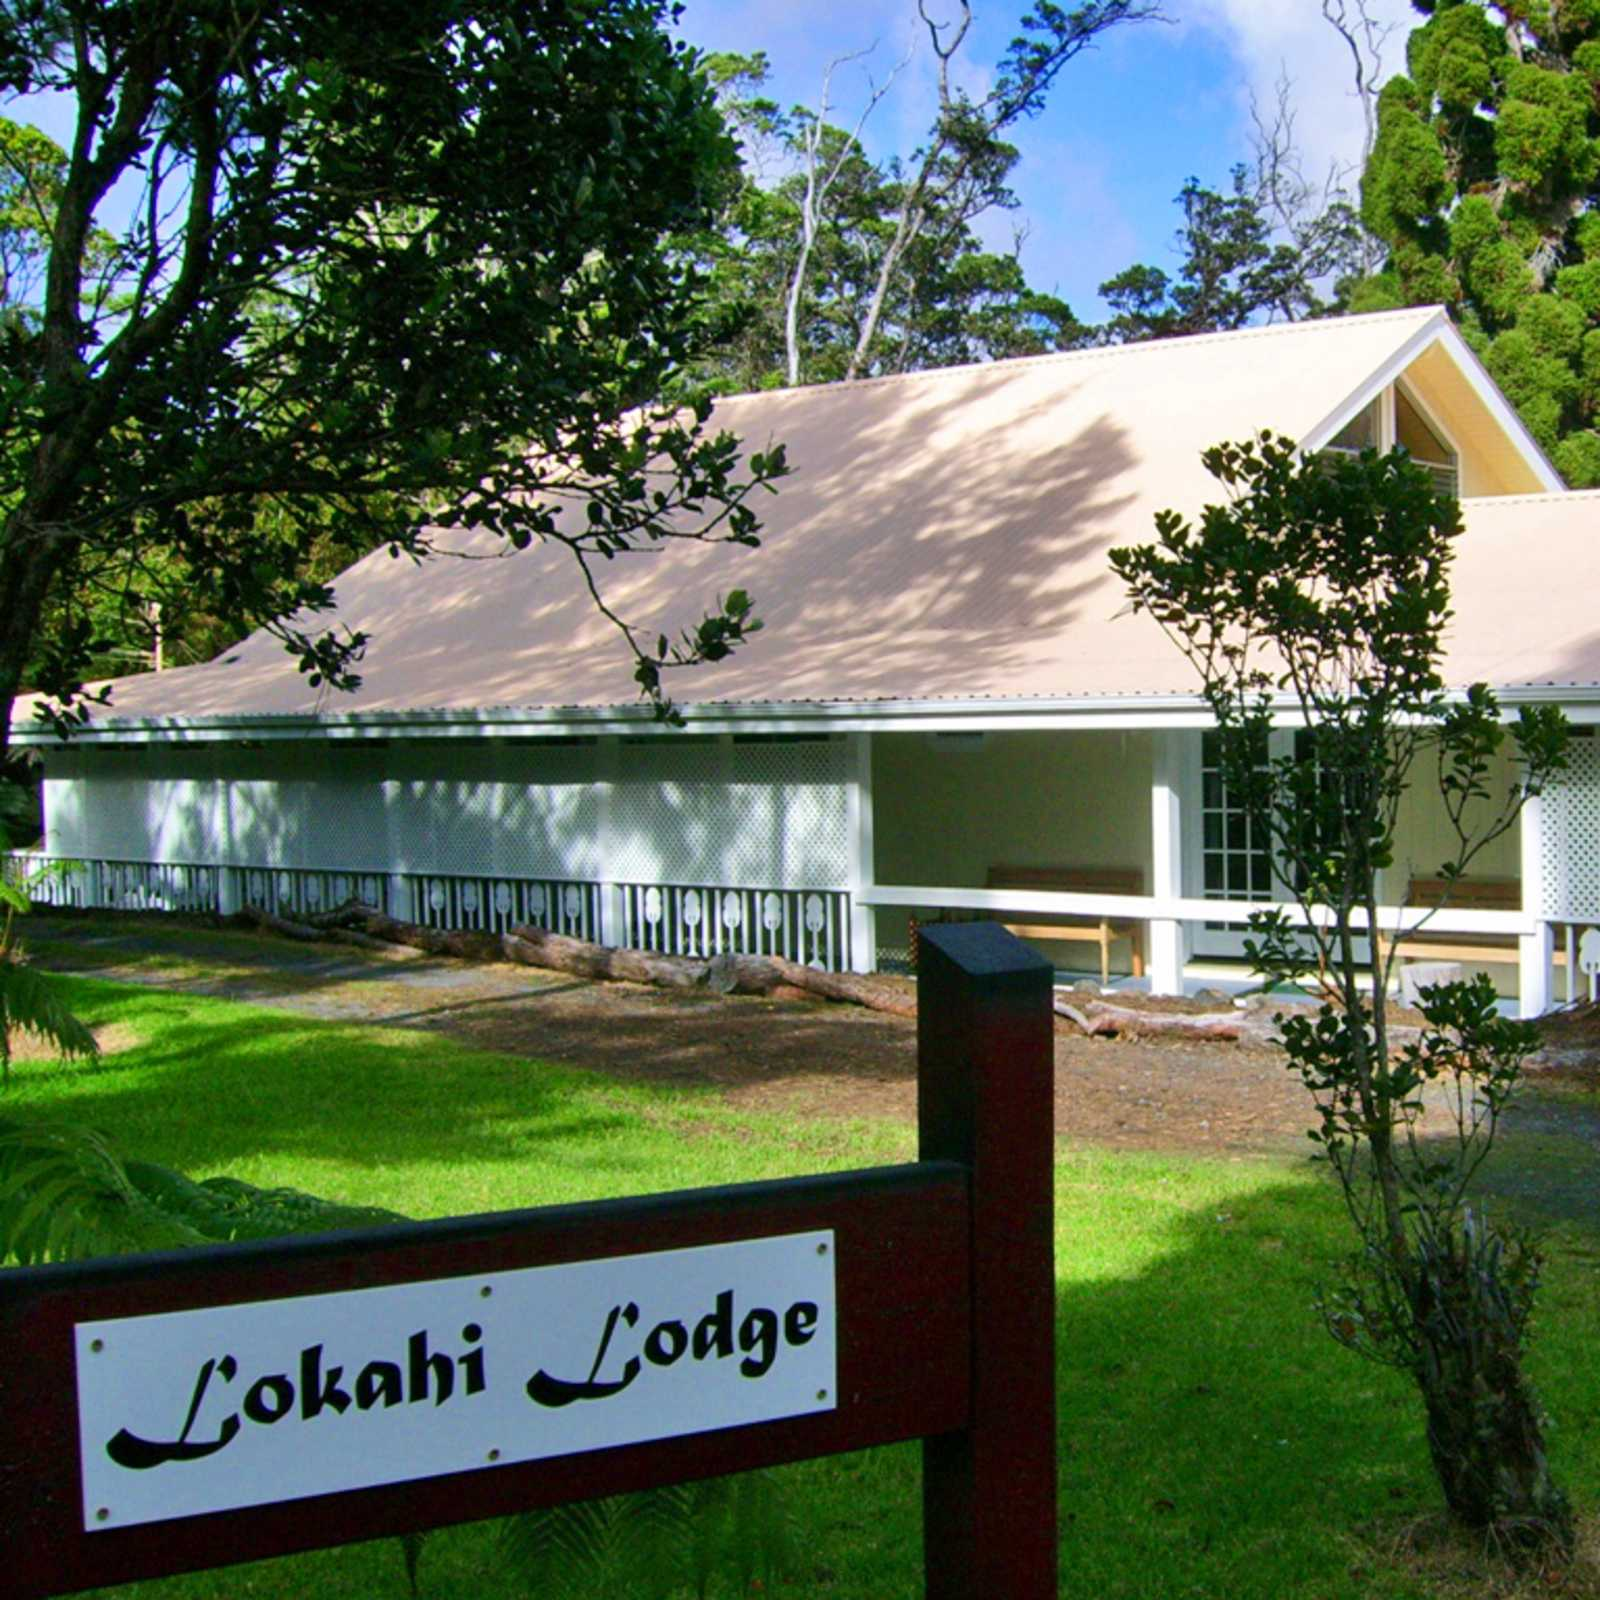 Lokahi Lodge at Volcano